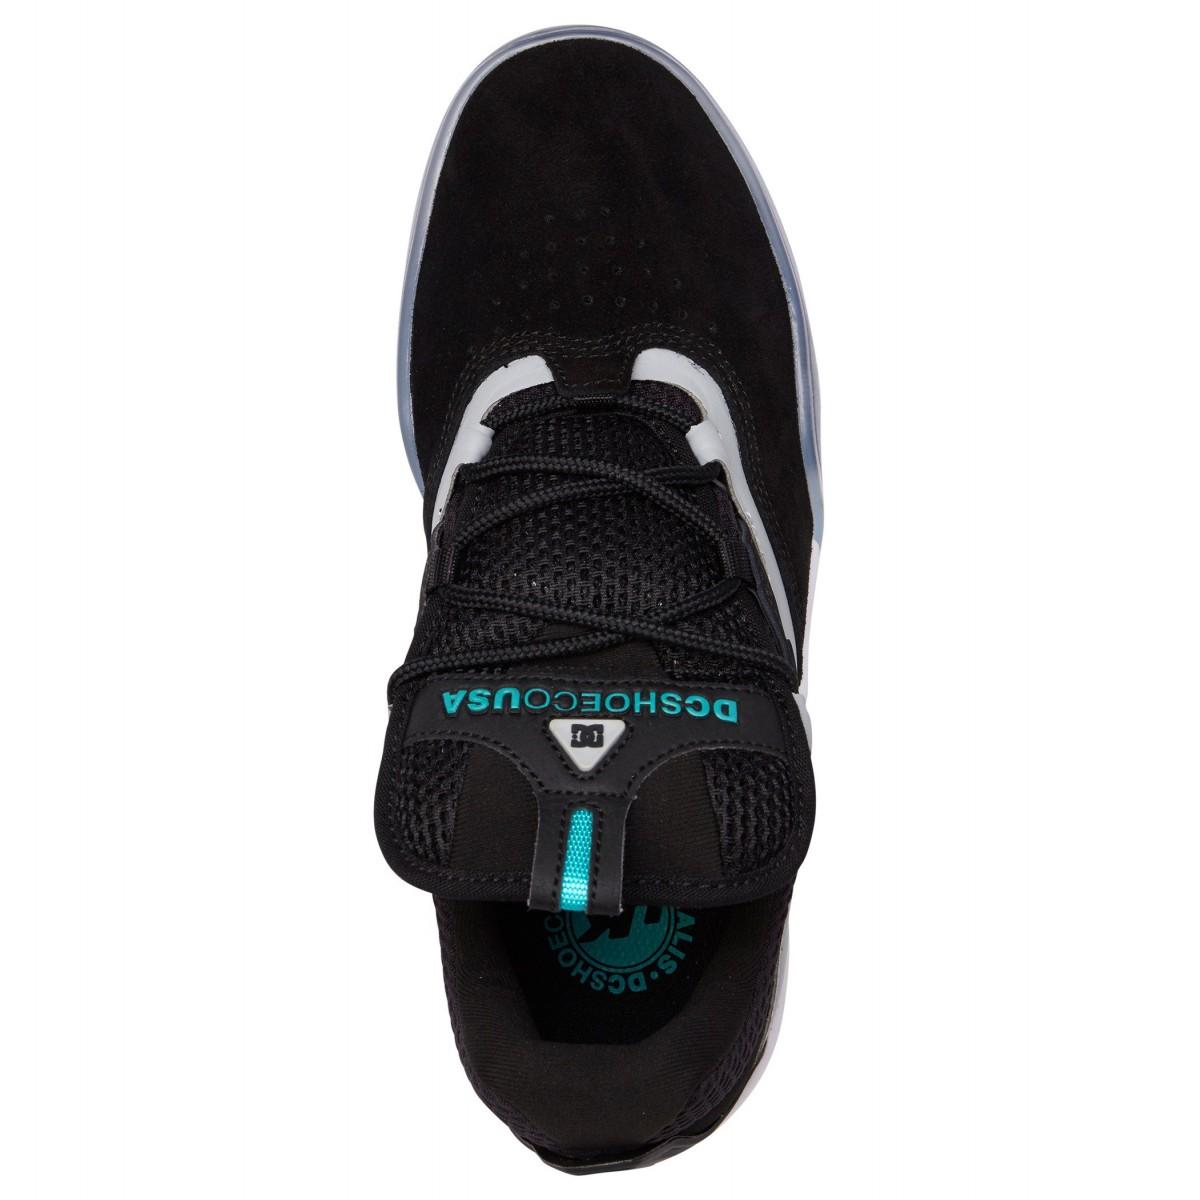 Scarpe DC Shoes Kalis SE Black Green Grey Scarpe Sportive da Skateboards